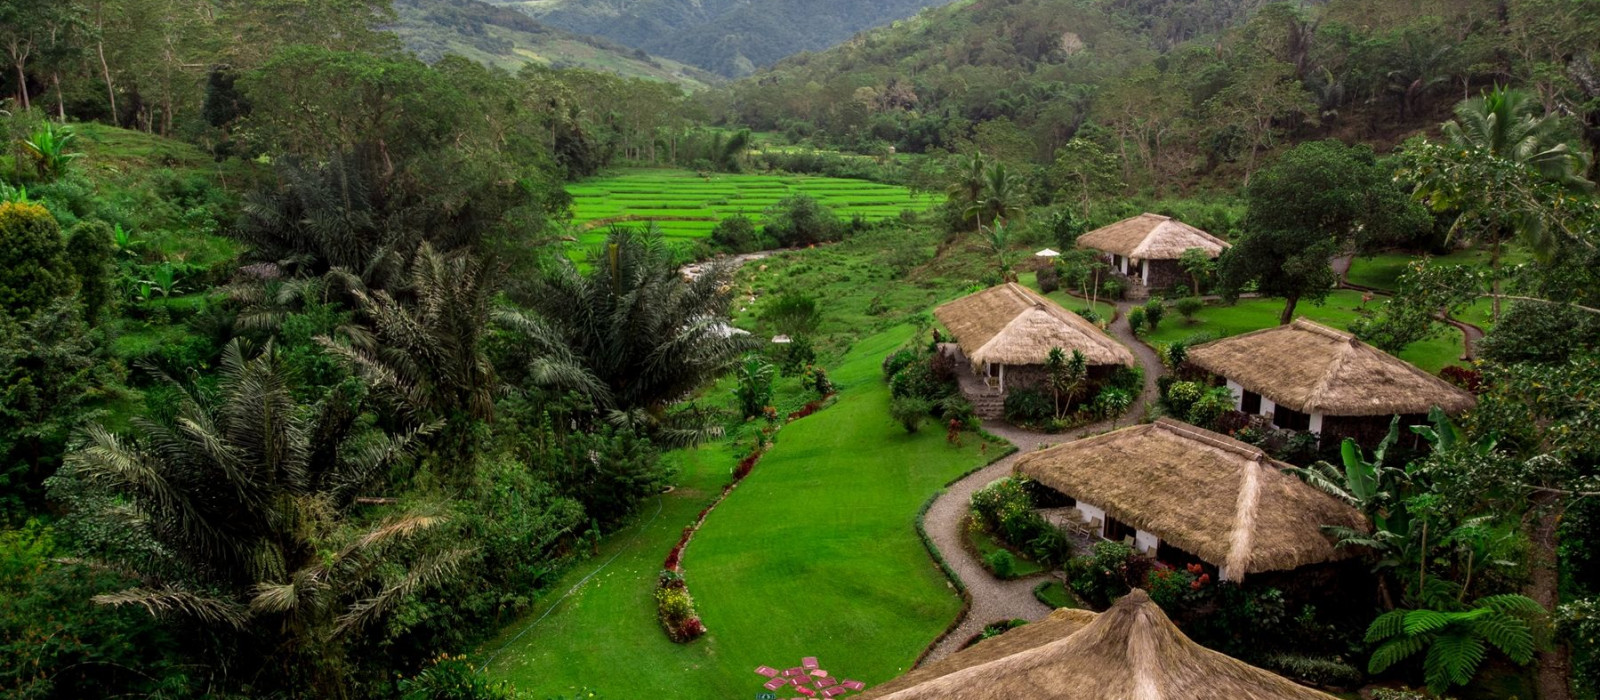 Reiseziel Moni Indonesien